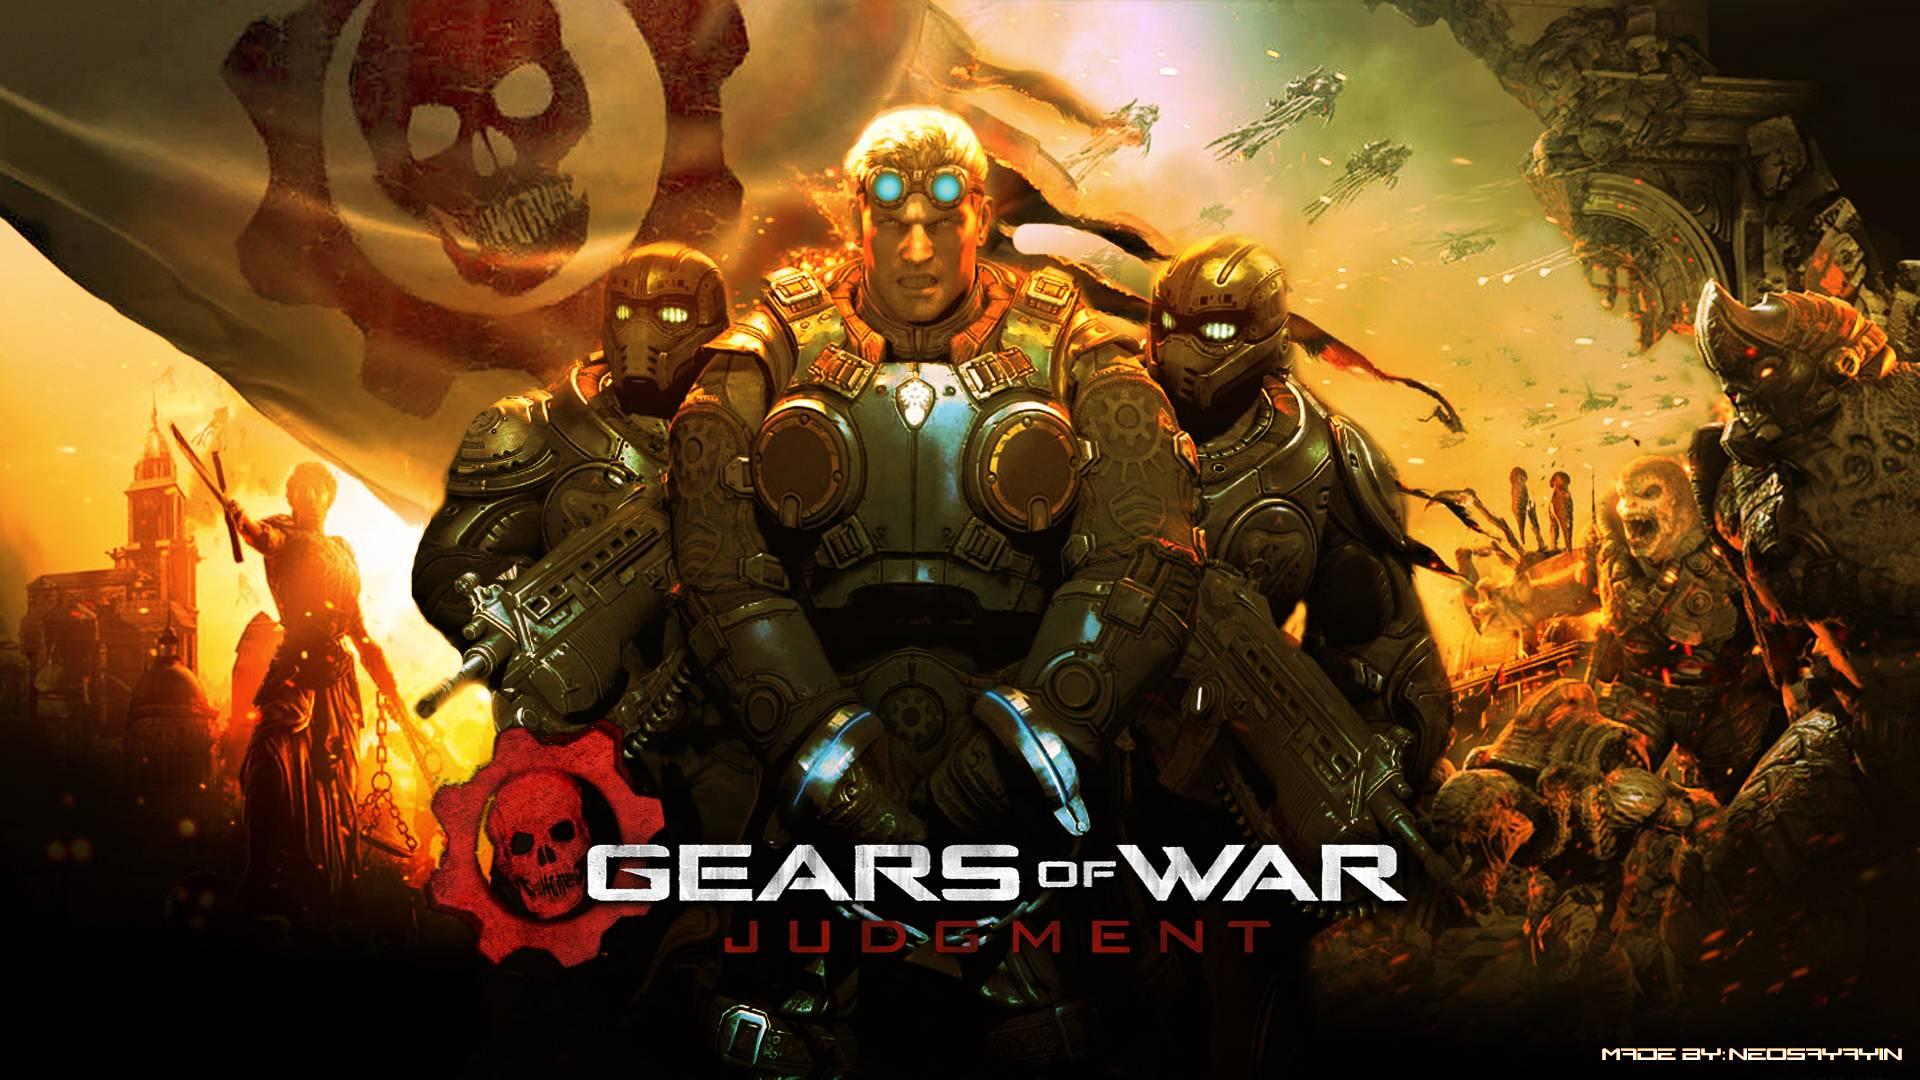 gears of war backgrounds - wallpaper cave